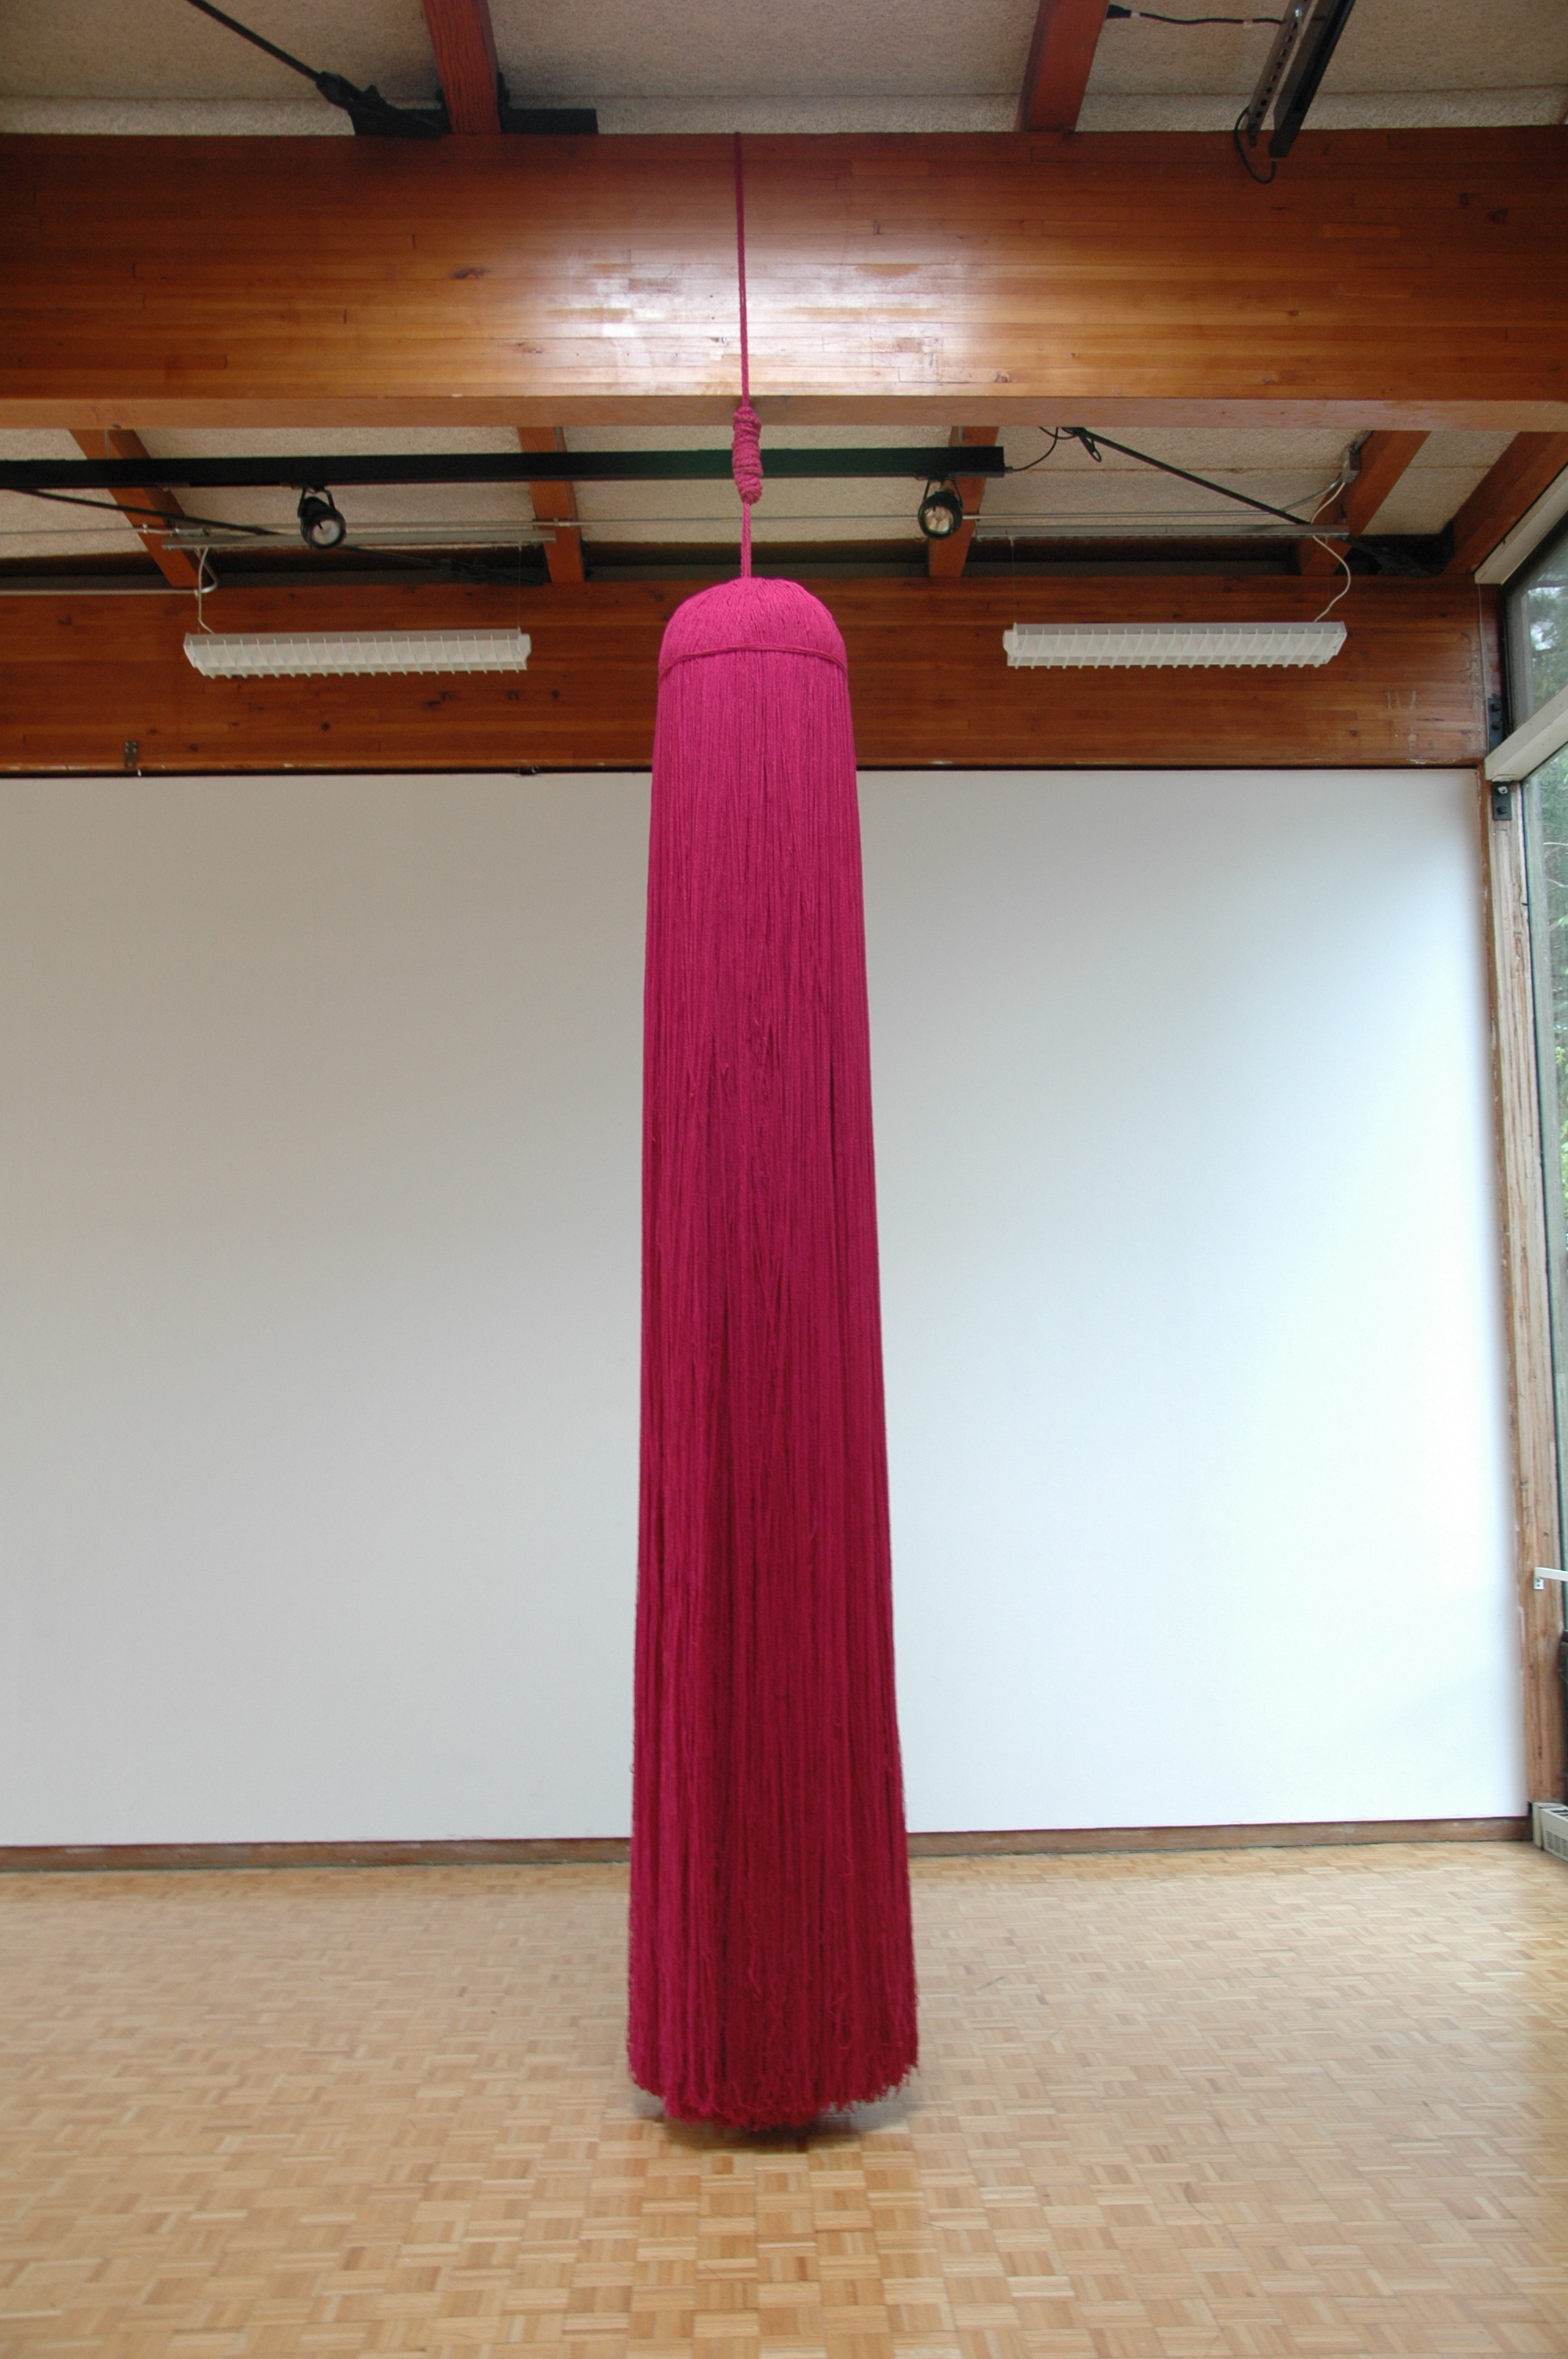 A Work in Progress: TRIM (Installation at Usdan Gallery, Bennington College), 2010, Acrylic yarn, 14' x 40' x 80' (Tassel detail)